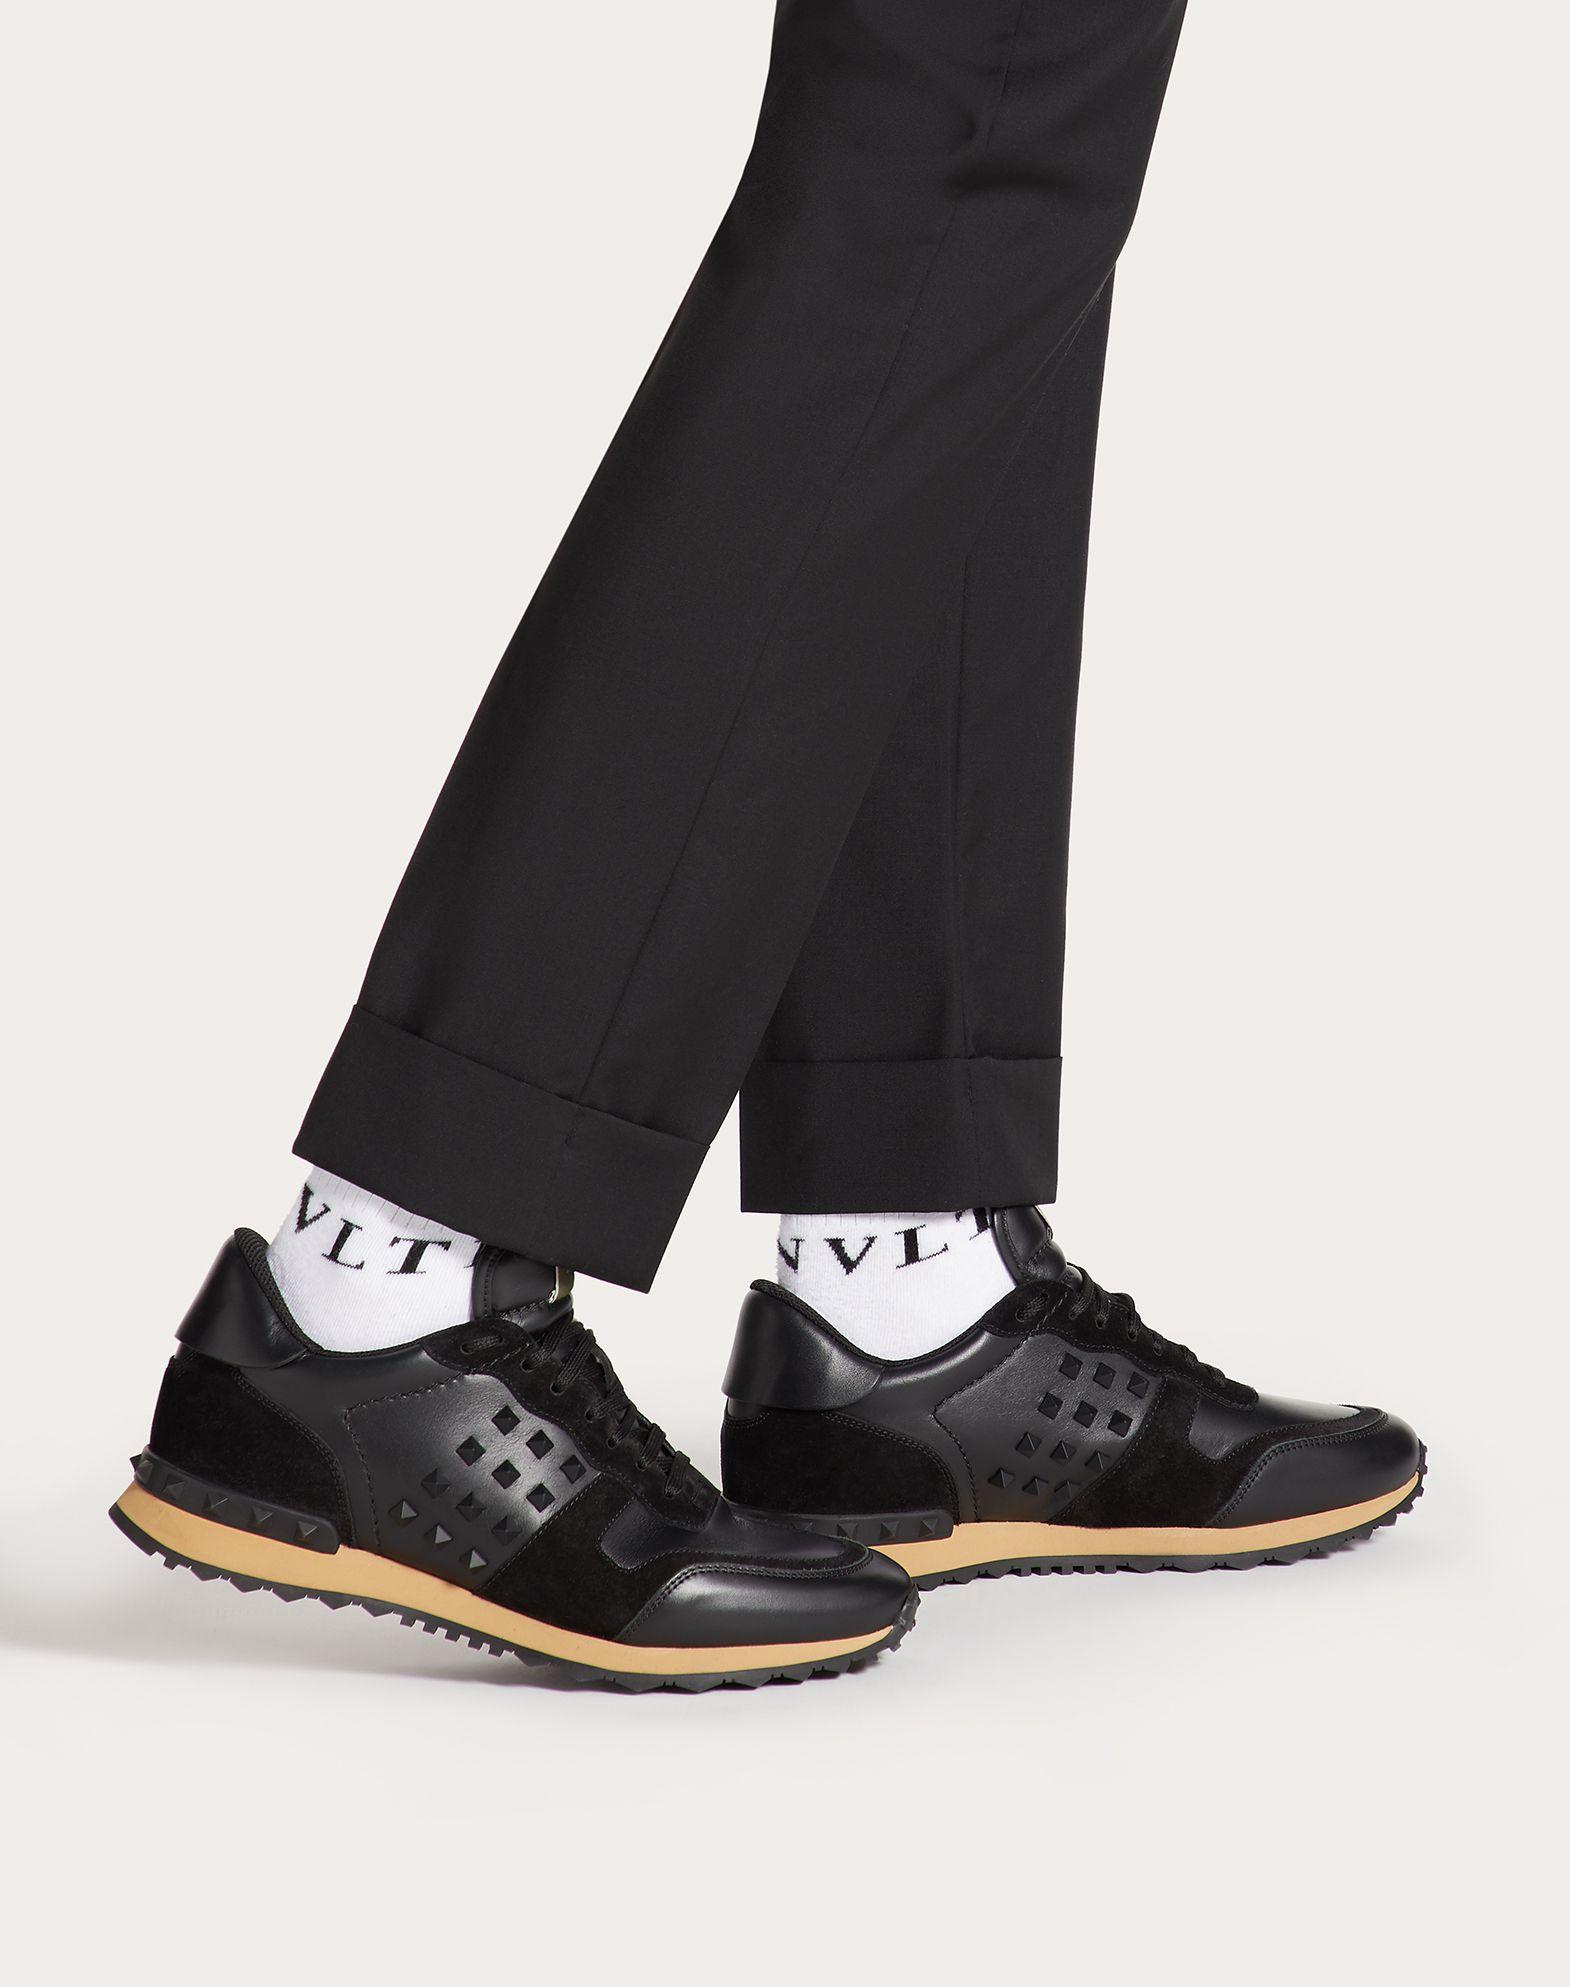 VALENTINO GARAVANI UOMO Rockstud 运动鞋 LOW-TOP SNEAKERS U b